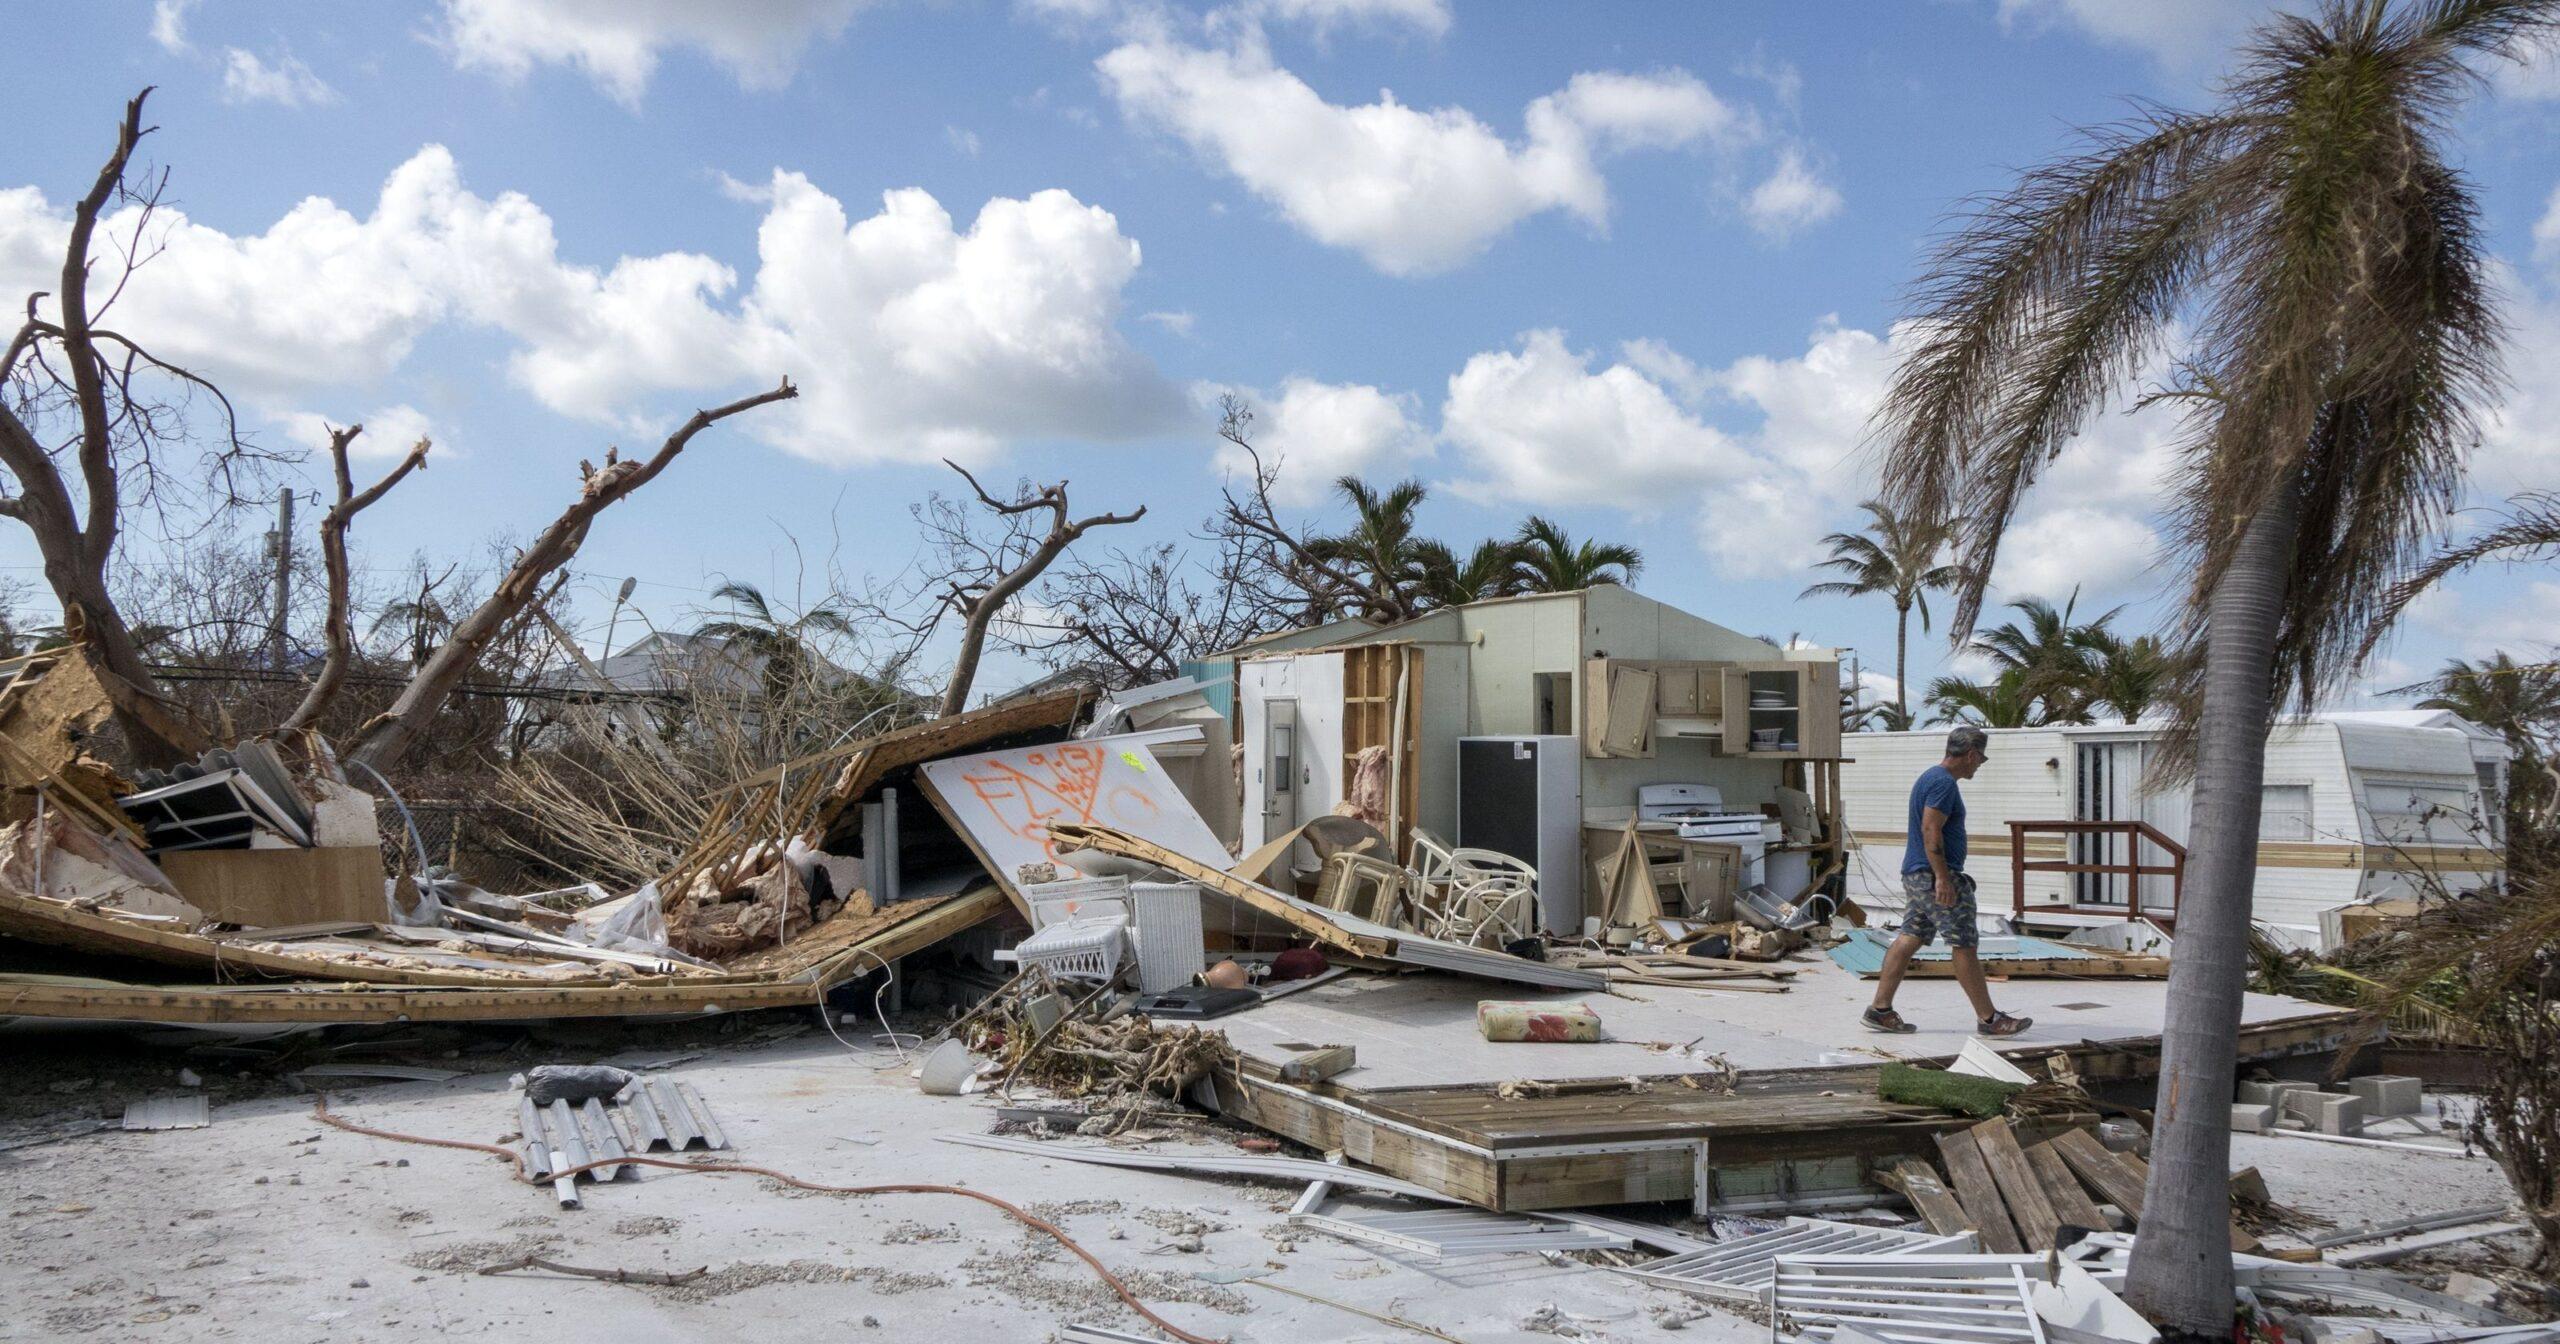 Home damage after Hurricane Irma